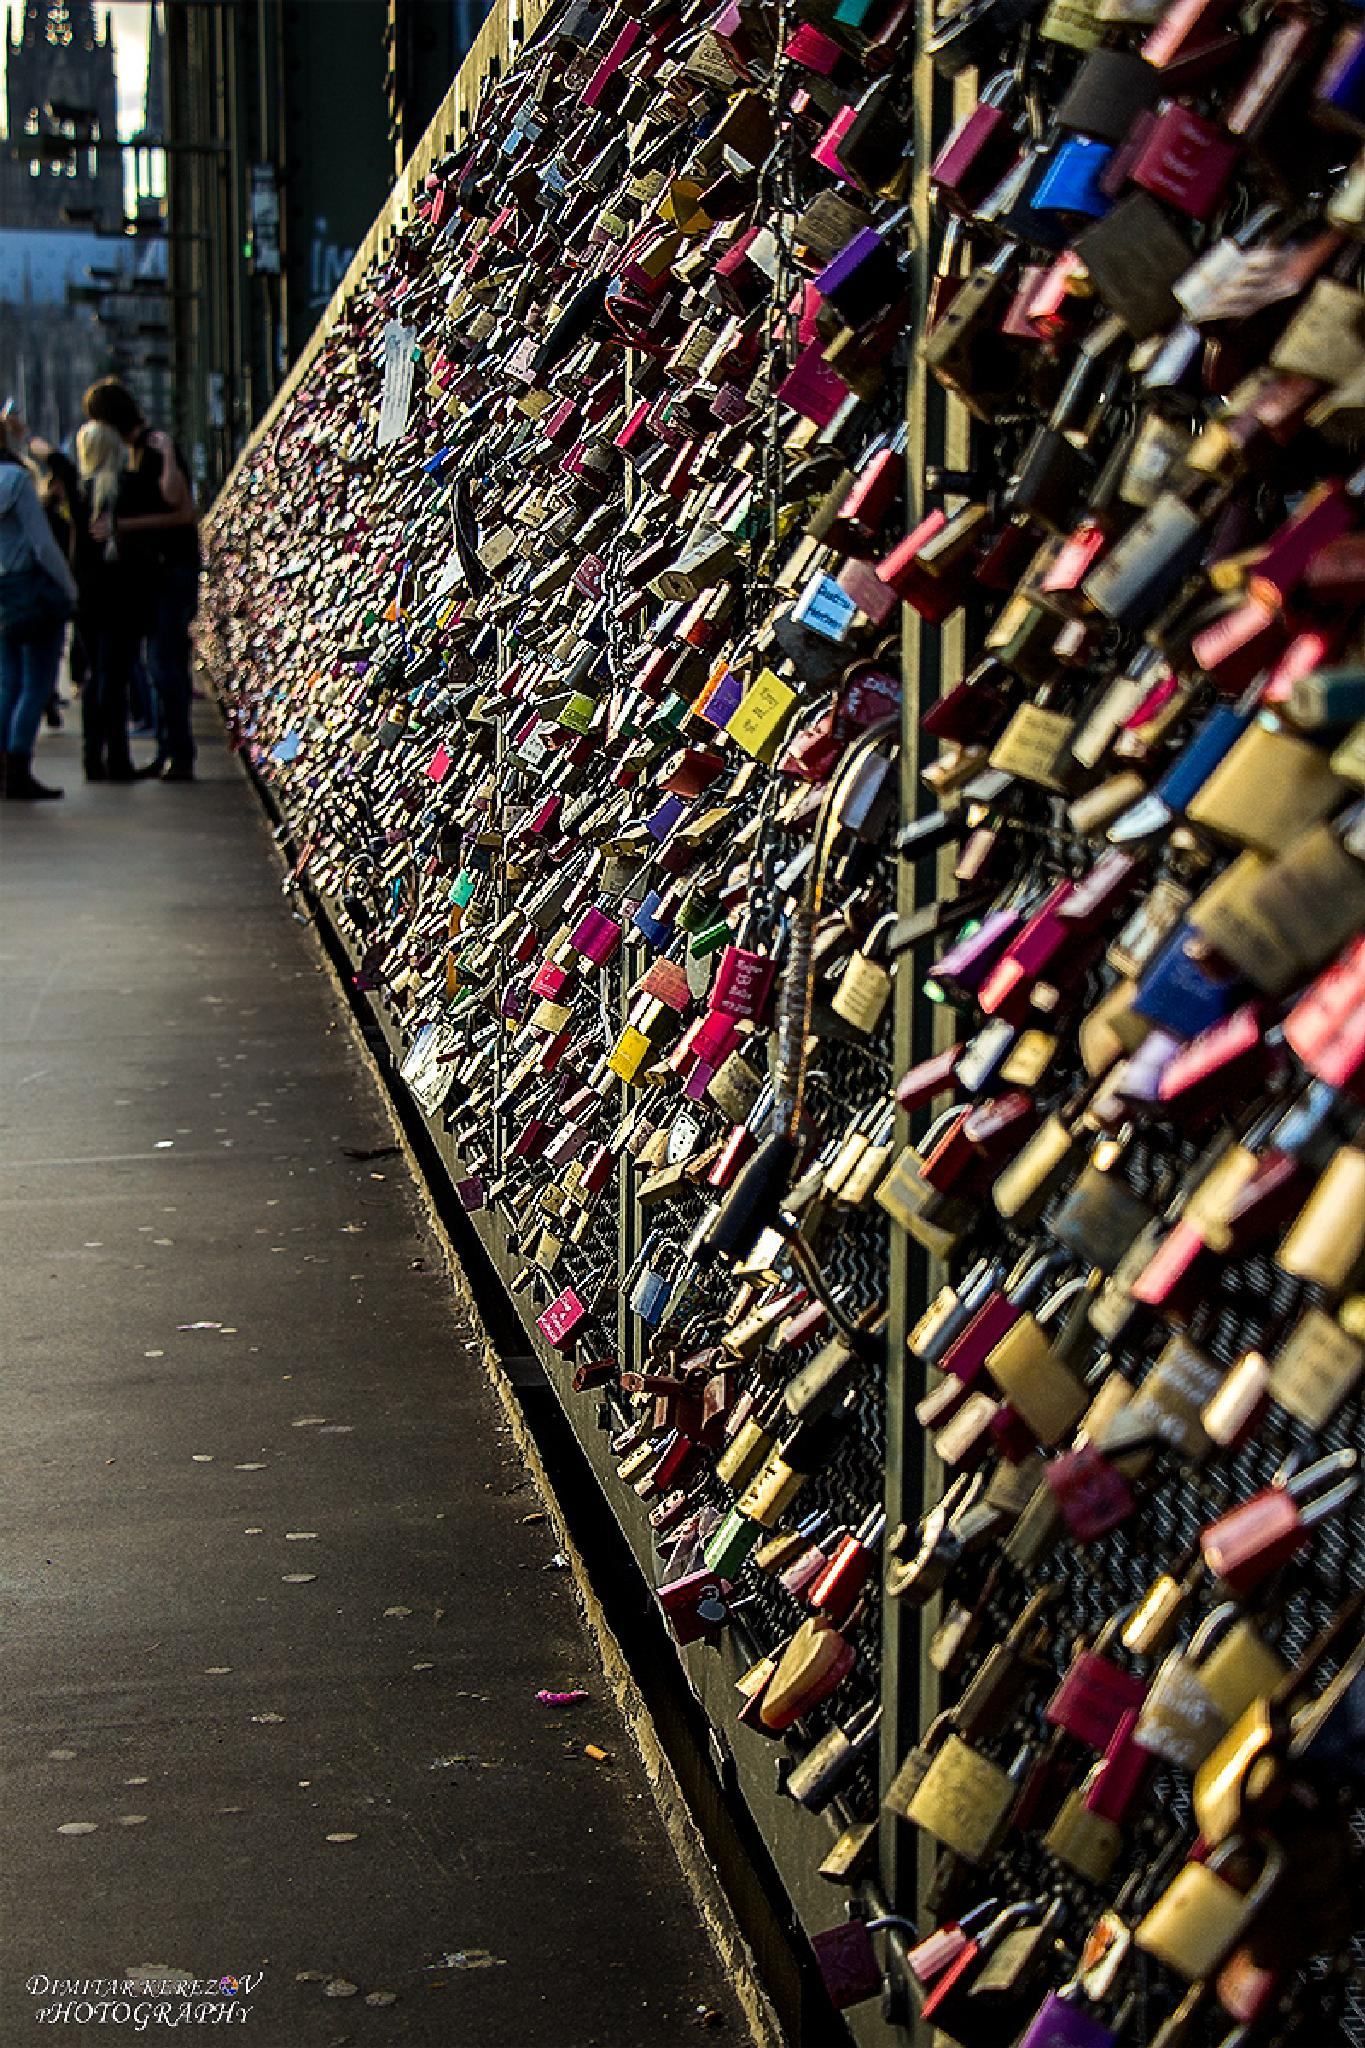 Lock The Love by Dimitar Kerezov